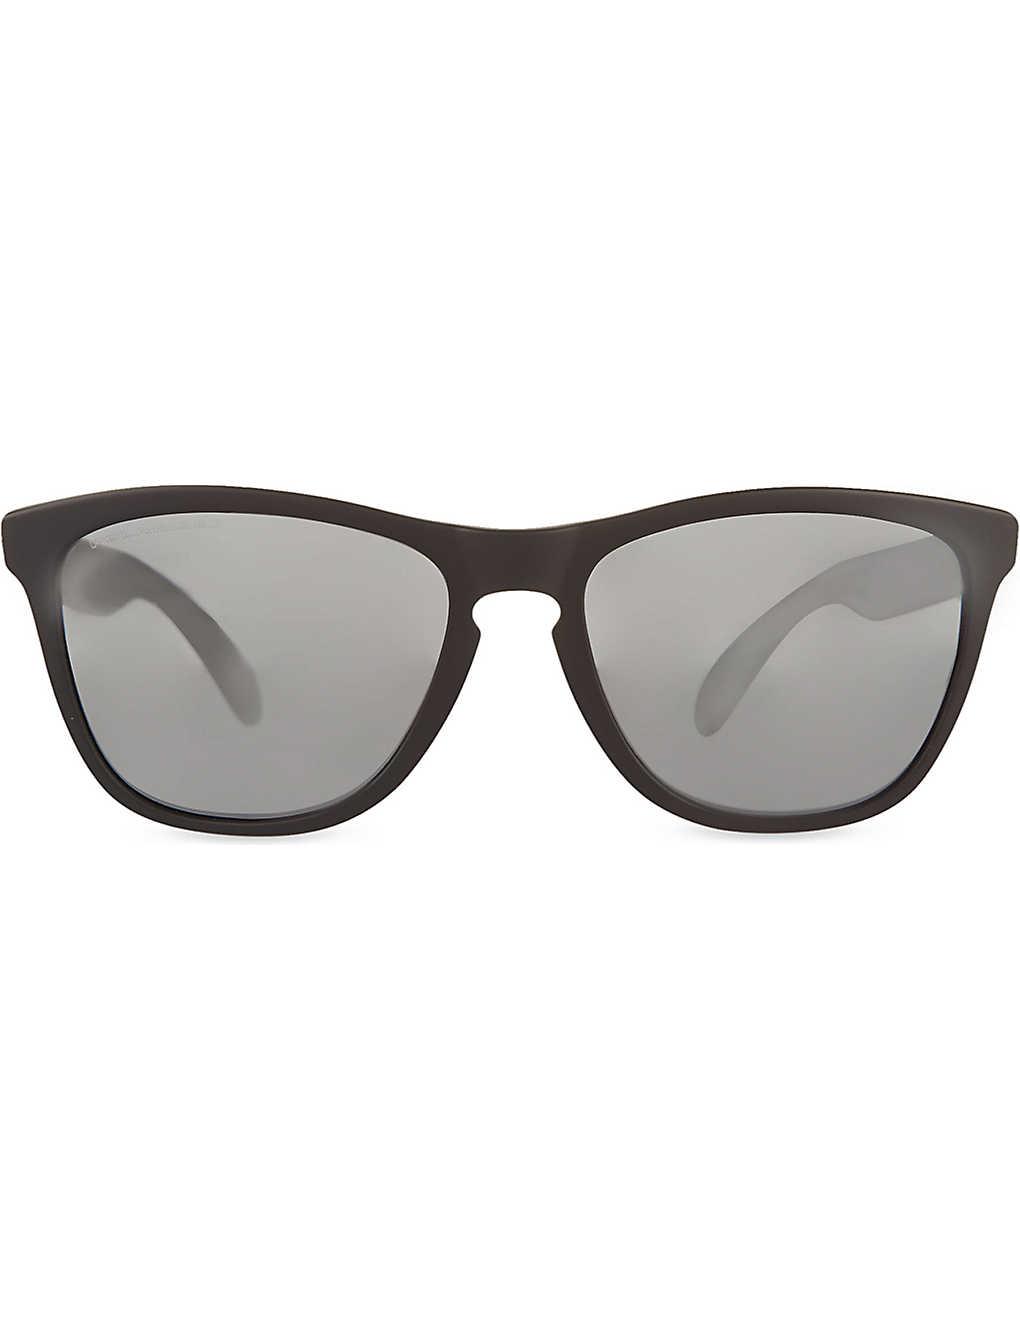 bec18bf164 OAKLEY - Frogskin OO9013 polarized sunglasses